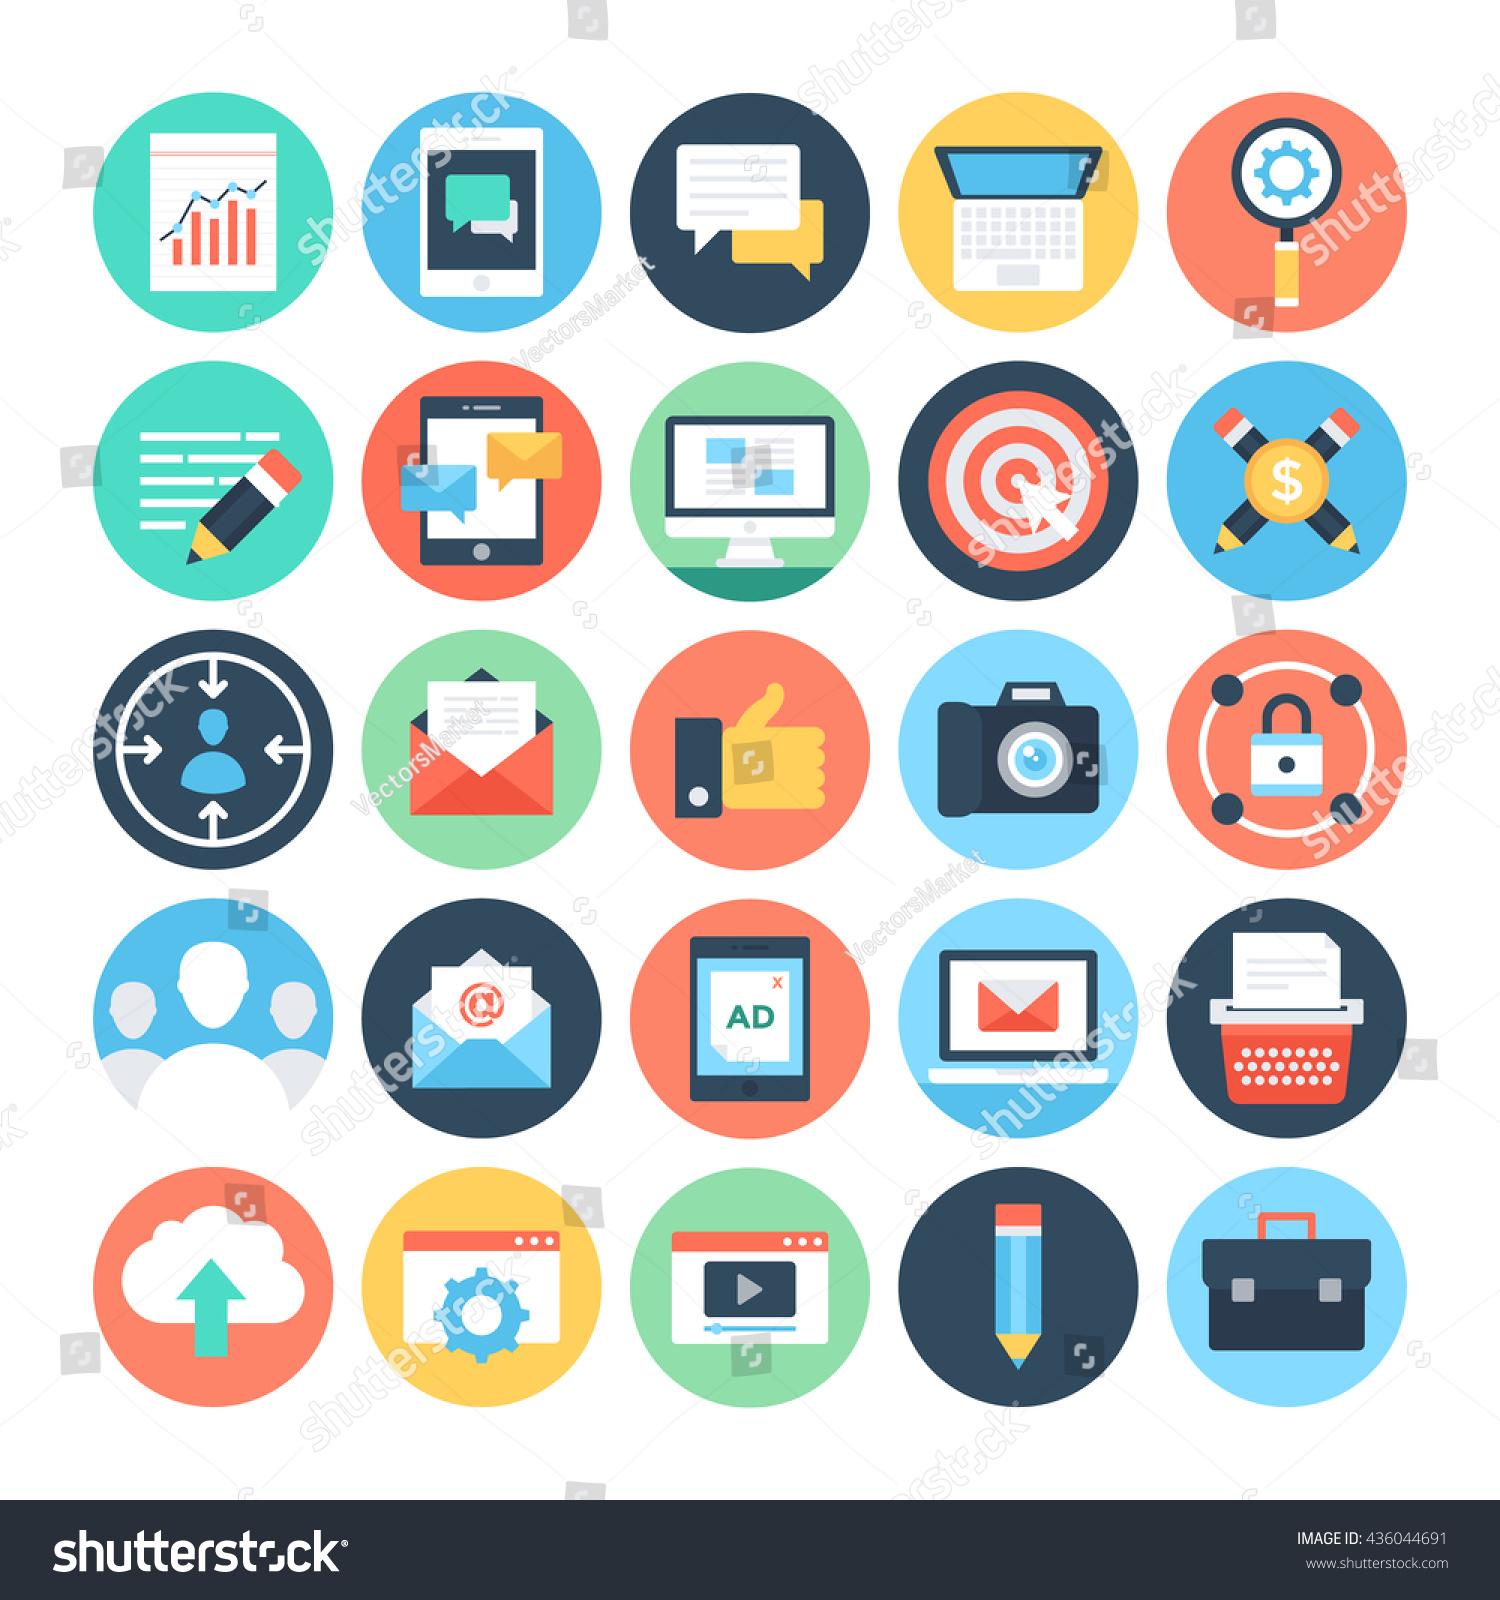 digital marketing vector icons 1 stock vector royalty free 436044691 https www shutterstock com image vector digital marketing vector icons 1 436044691